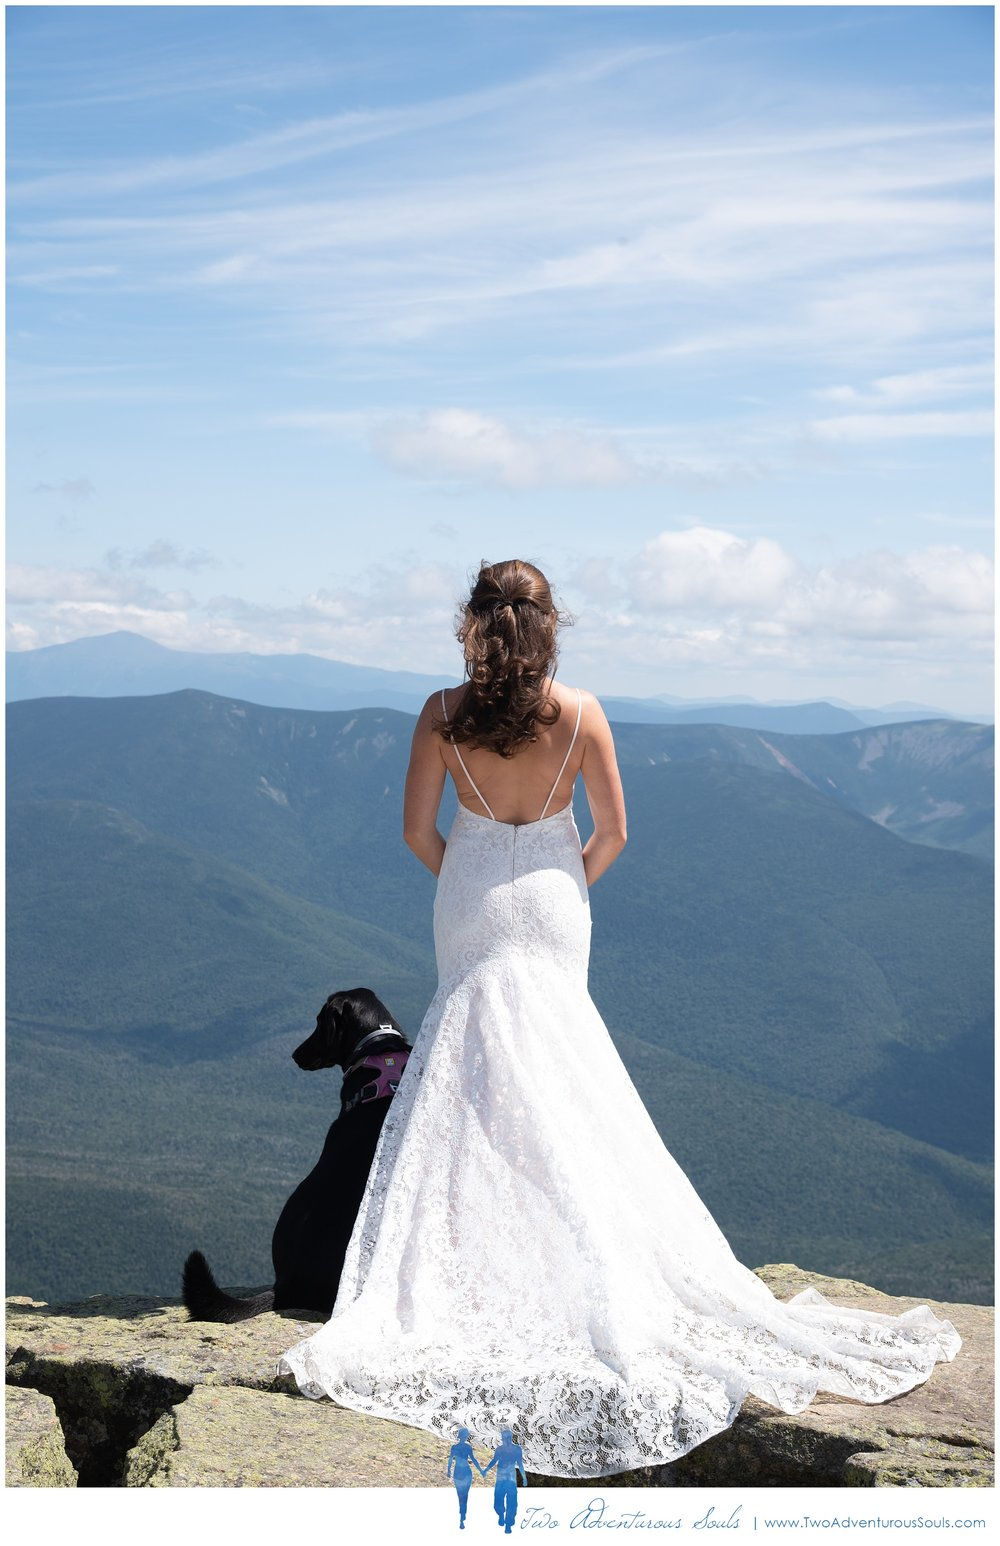 081818 - Chana & Rich - wedding SNEAKS-118_Adventure Wedding, Destination Wedding Photographers.jpg